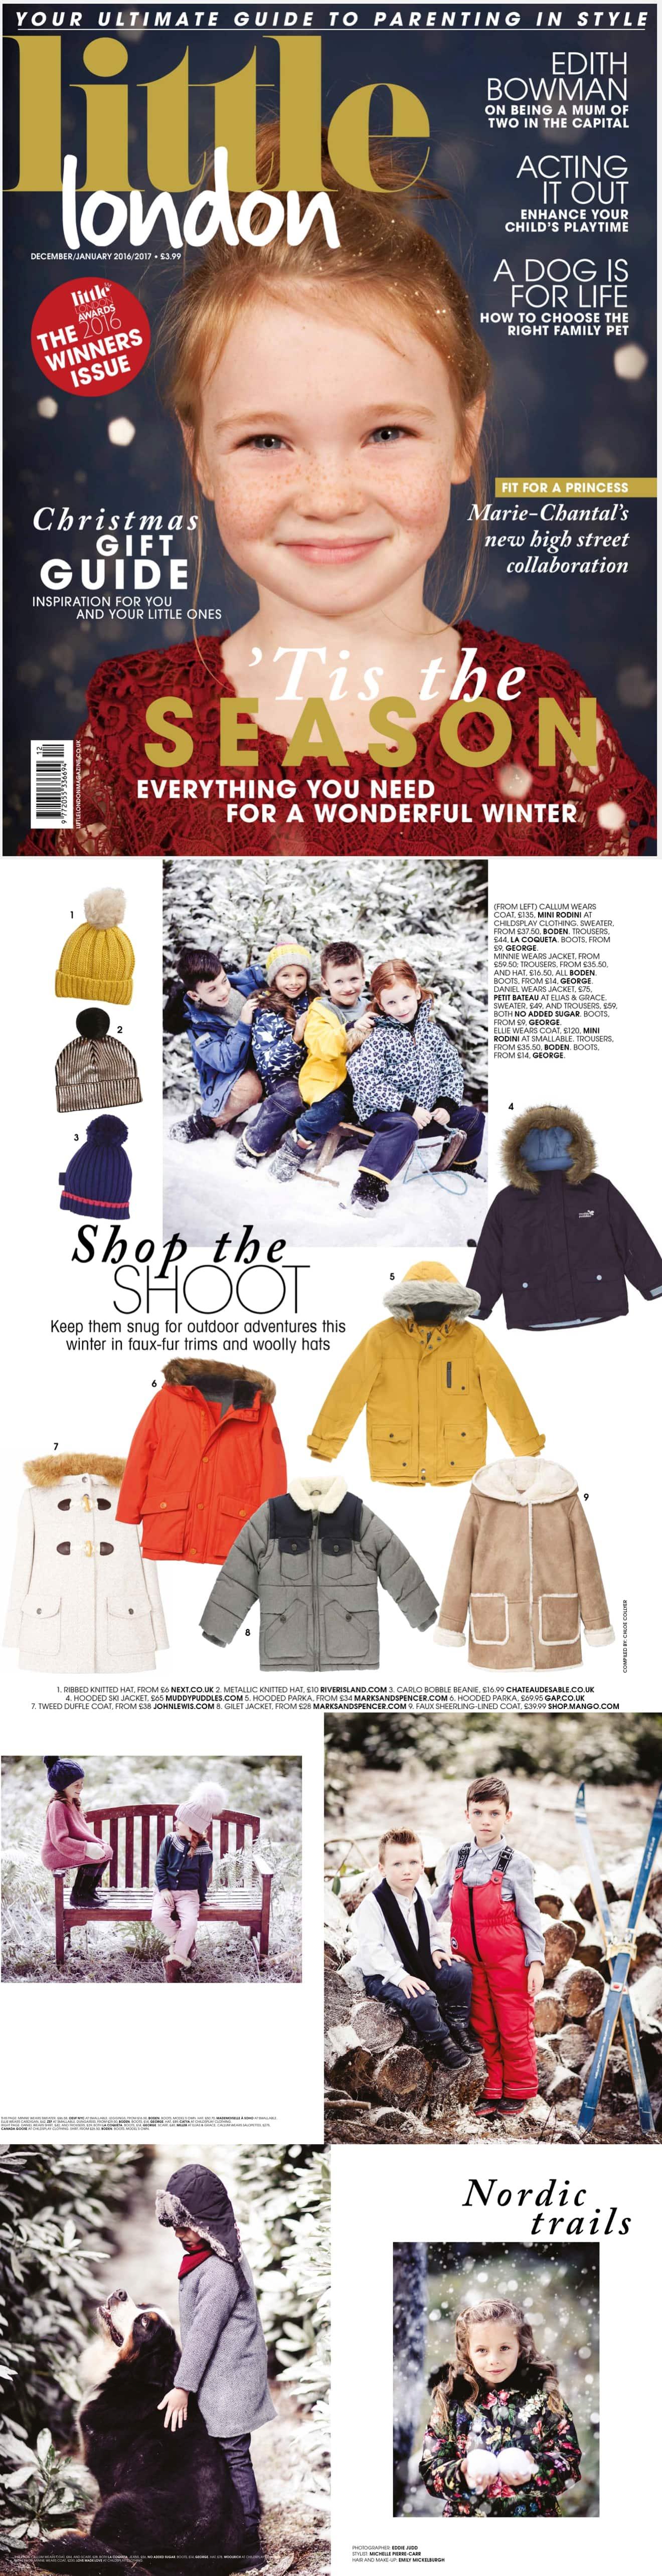 Little-London-Nordic-winter-fashion-kids-eddie-judd-photography-pierre-carr